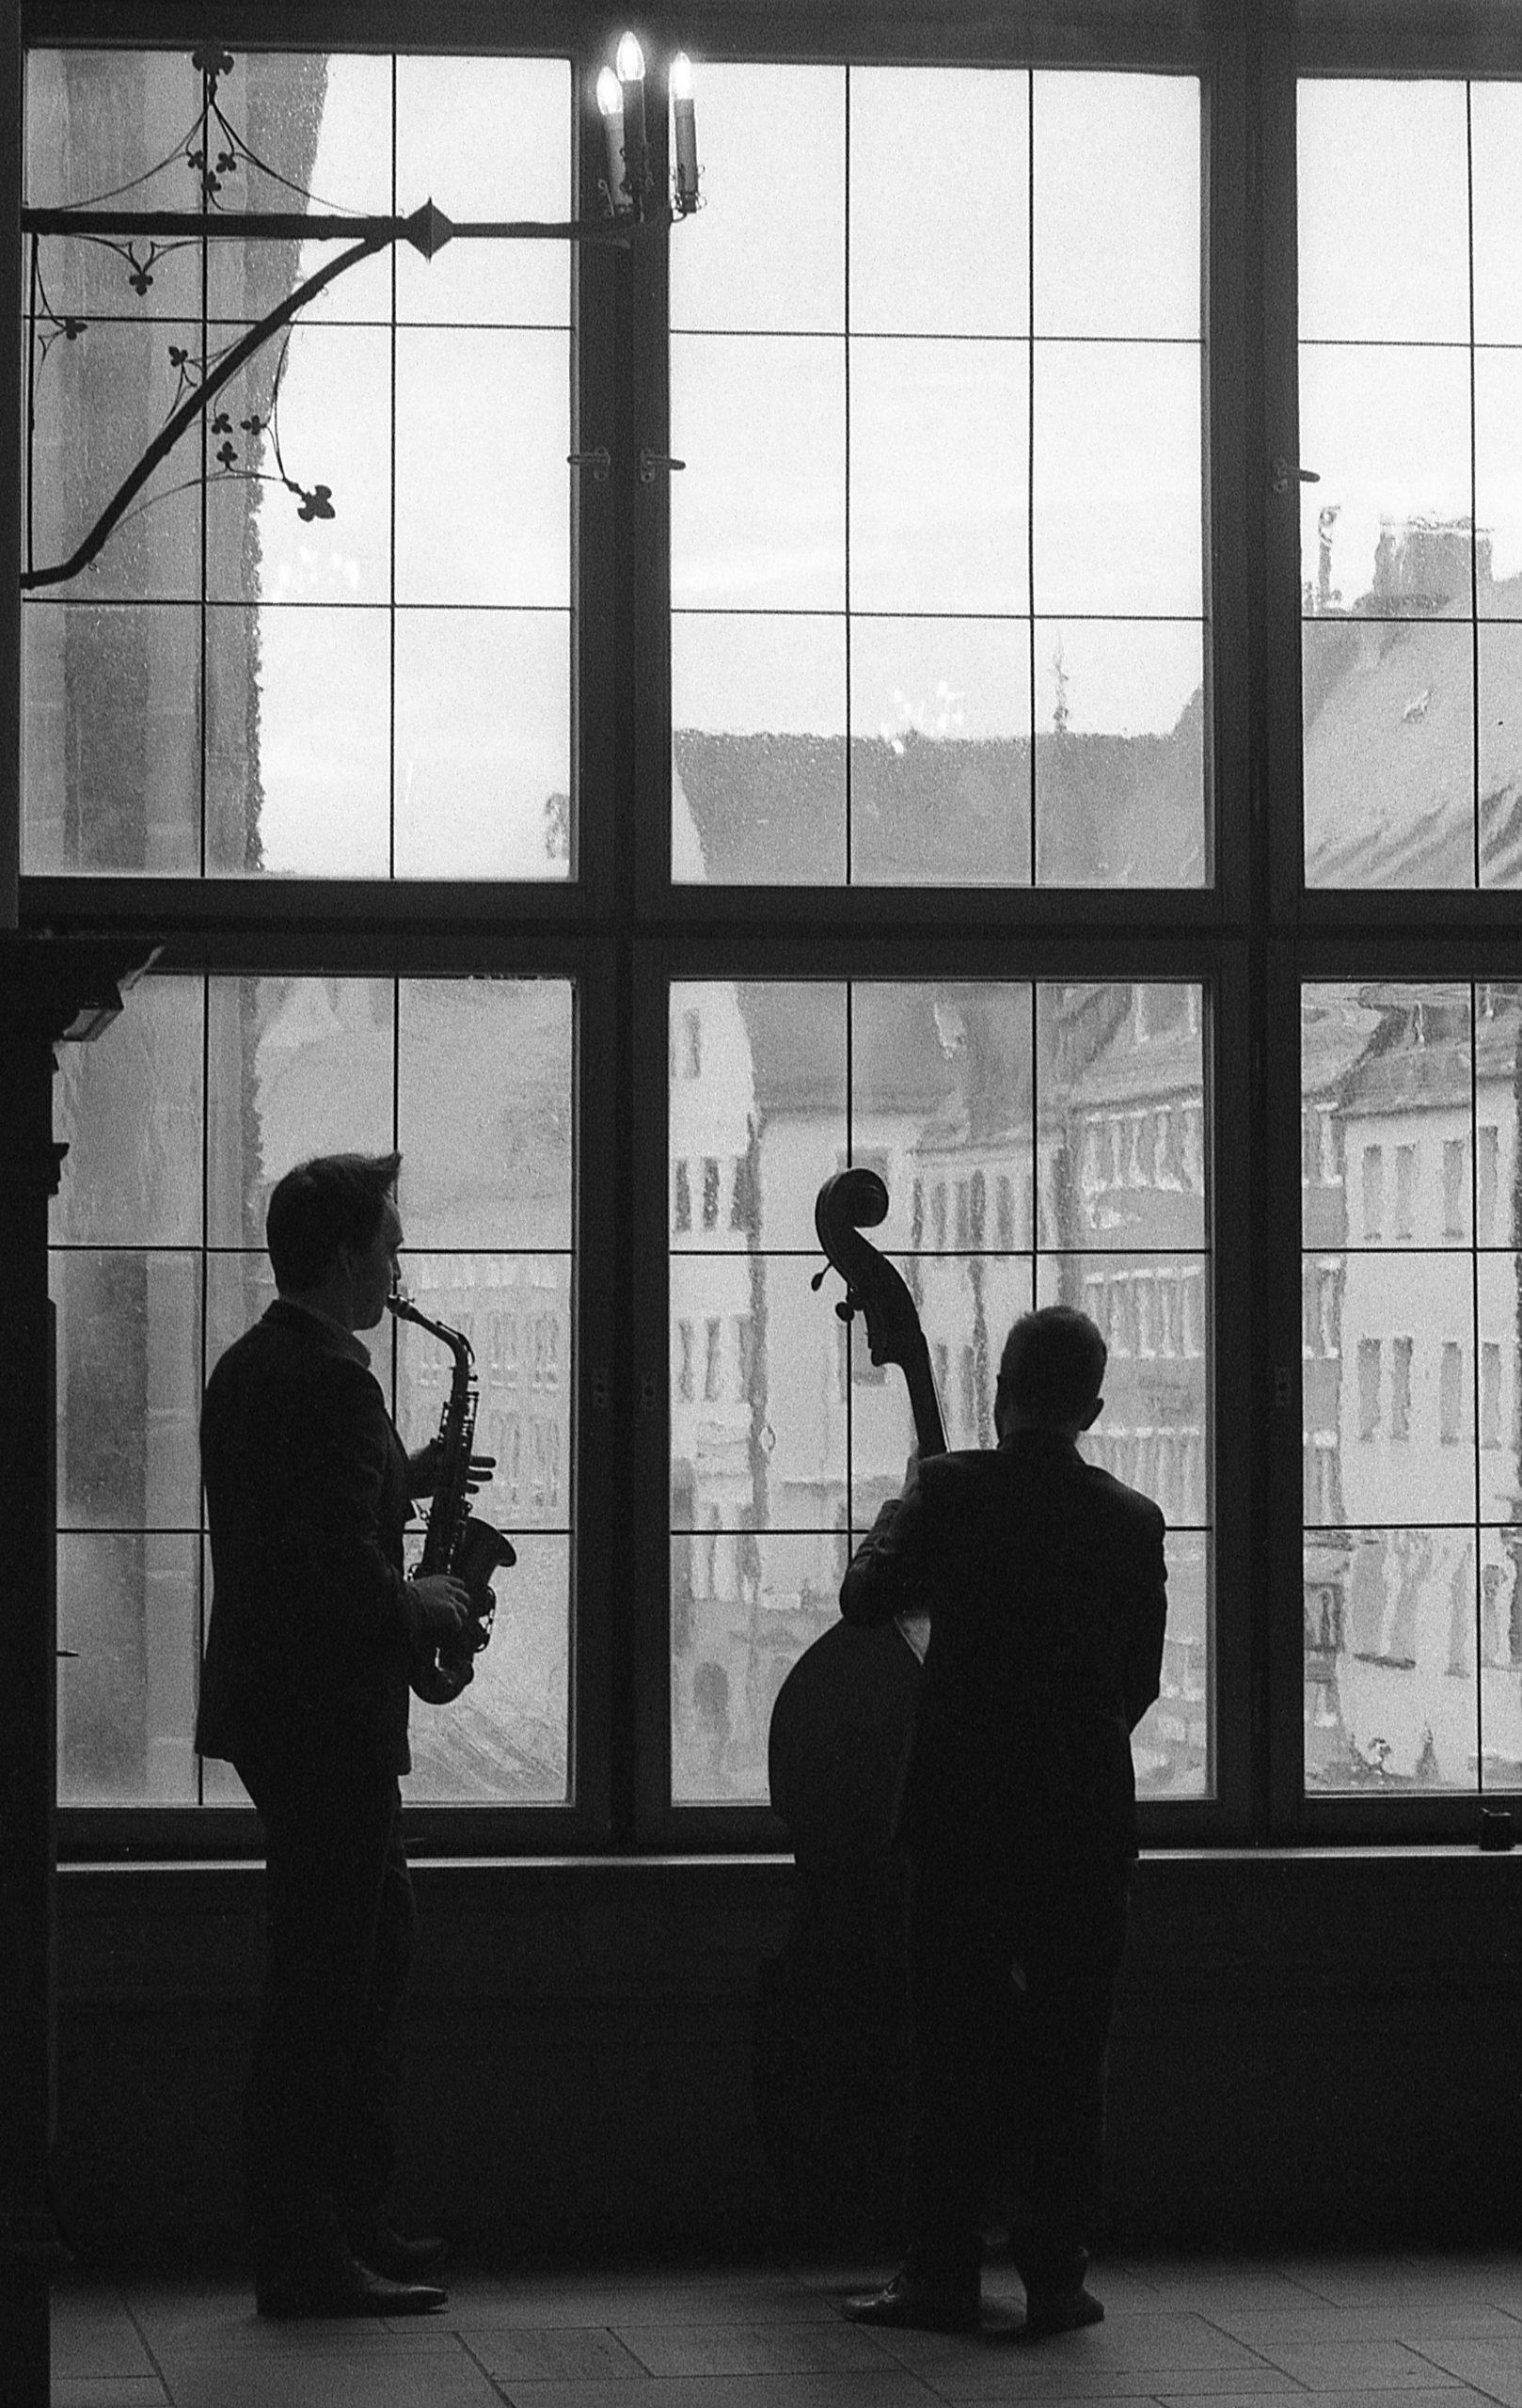 Peter Christof im alten Rathaussaal Nürnberg